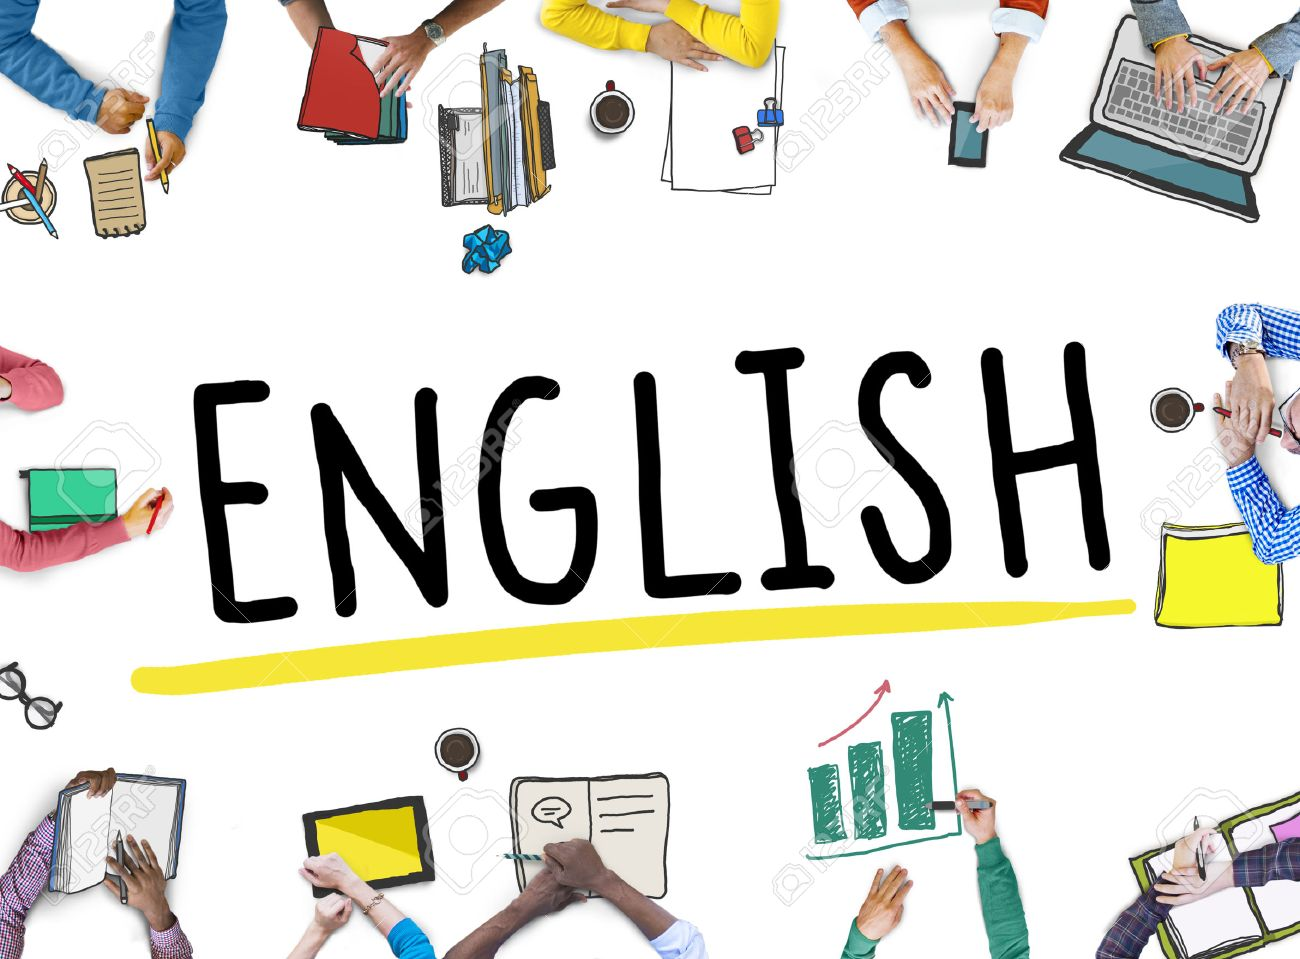 52351011-english-british-england-language-education-concept